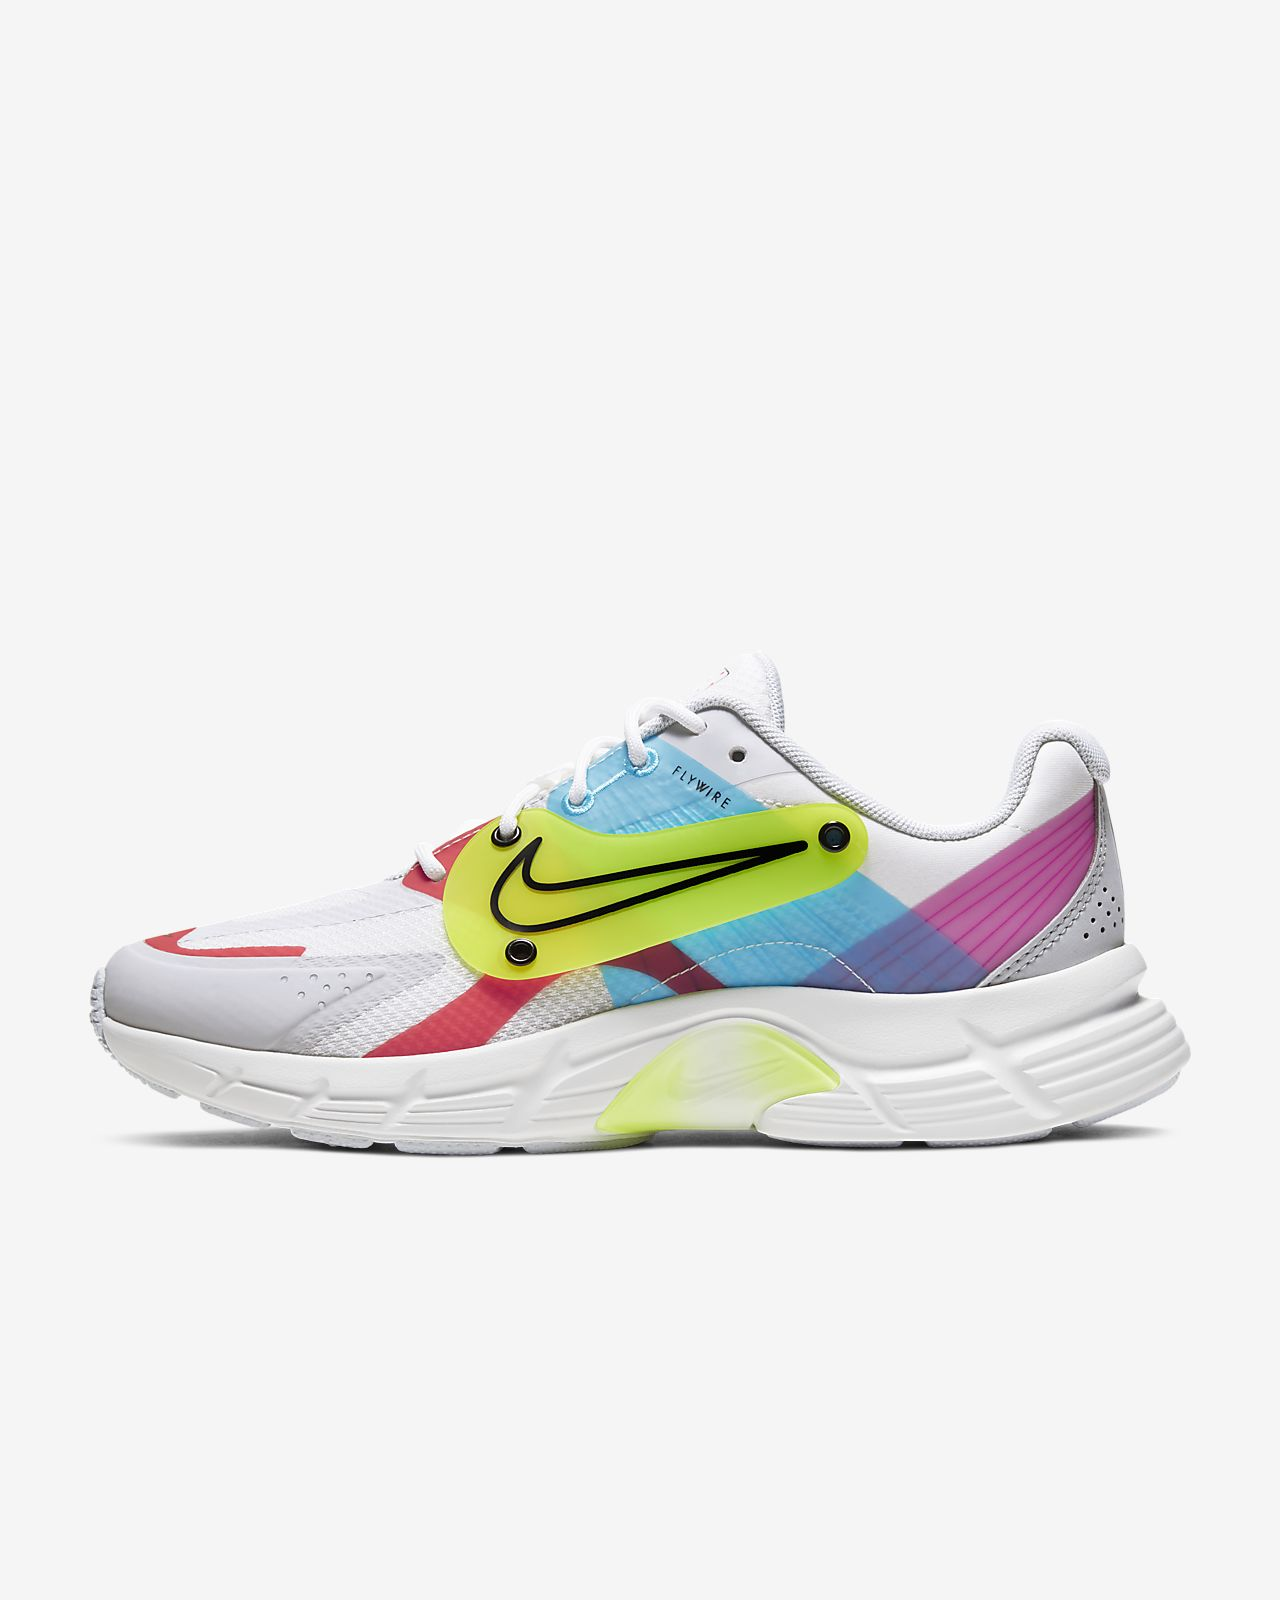 Nike Alphina 5000 女鞋